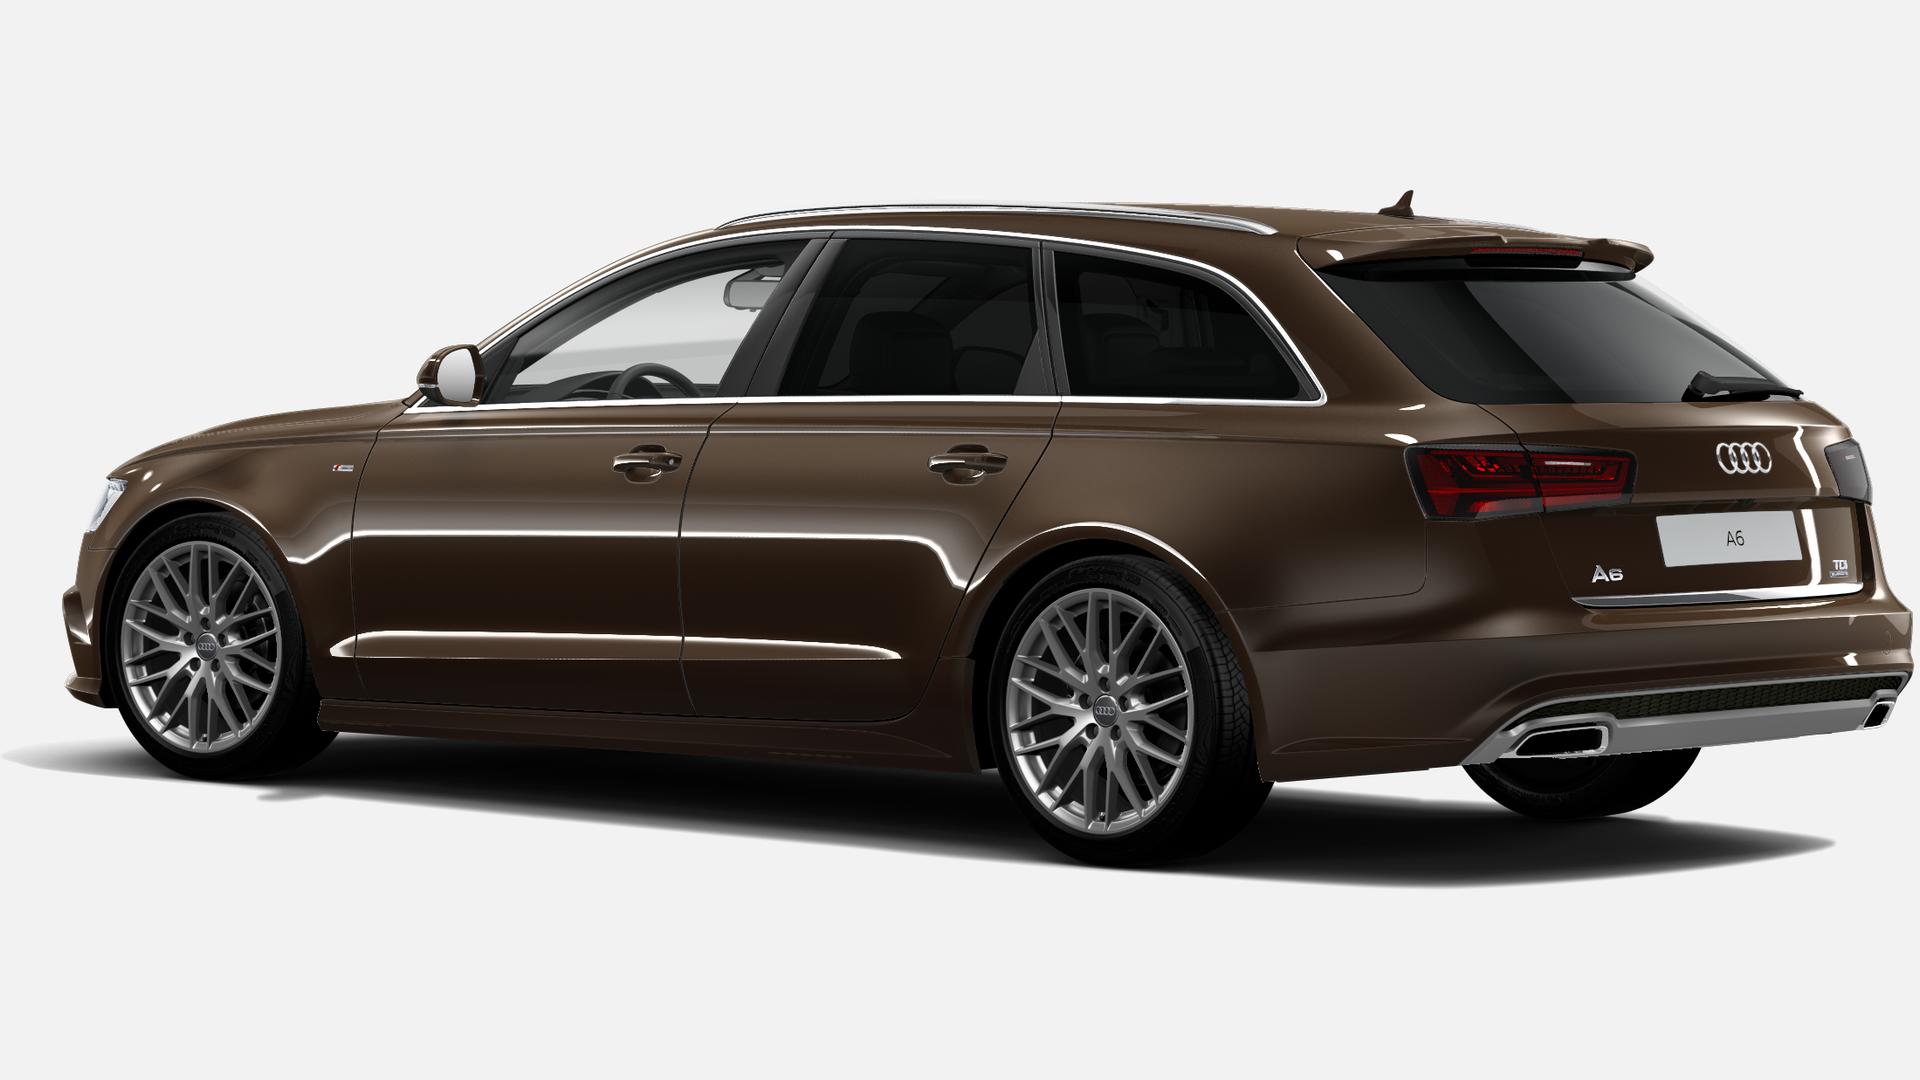 Vista Tres cuartos trasera izquierda de Audi A6 Avant 2.0 TDI S Line Edition quattro S Tronic 140 kW (190 CV)